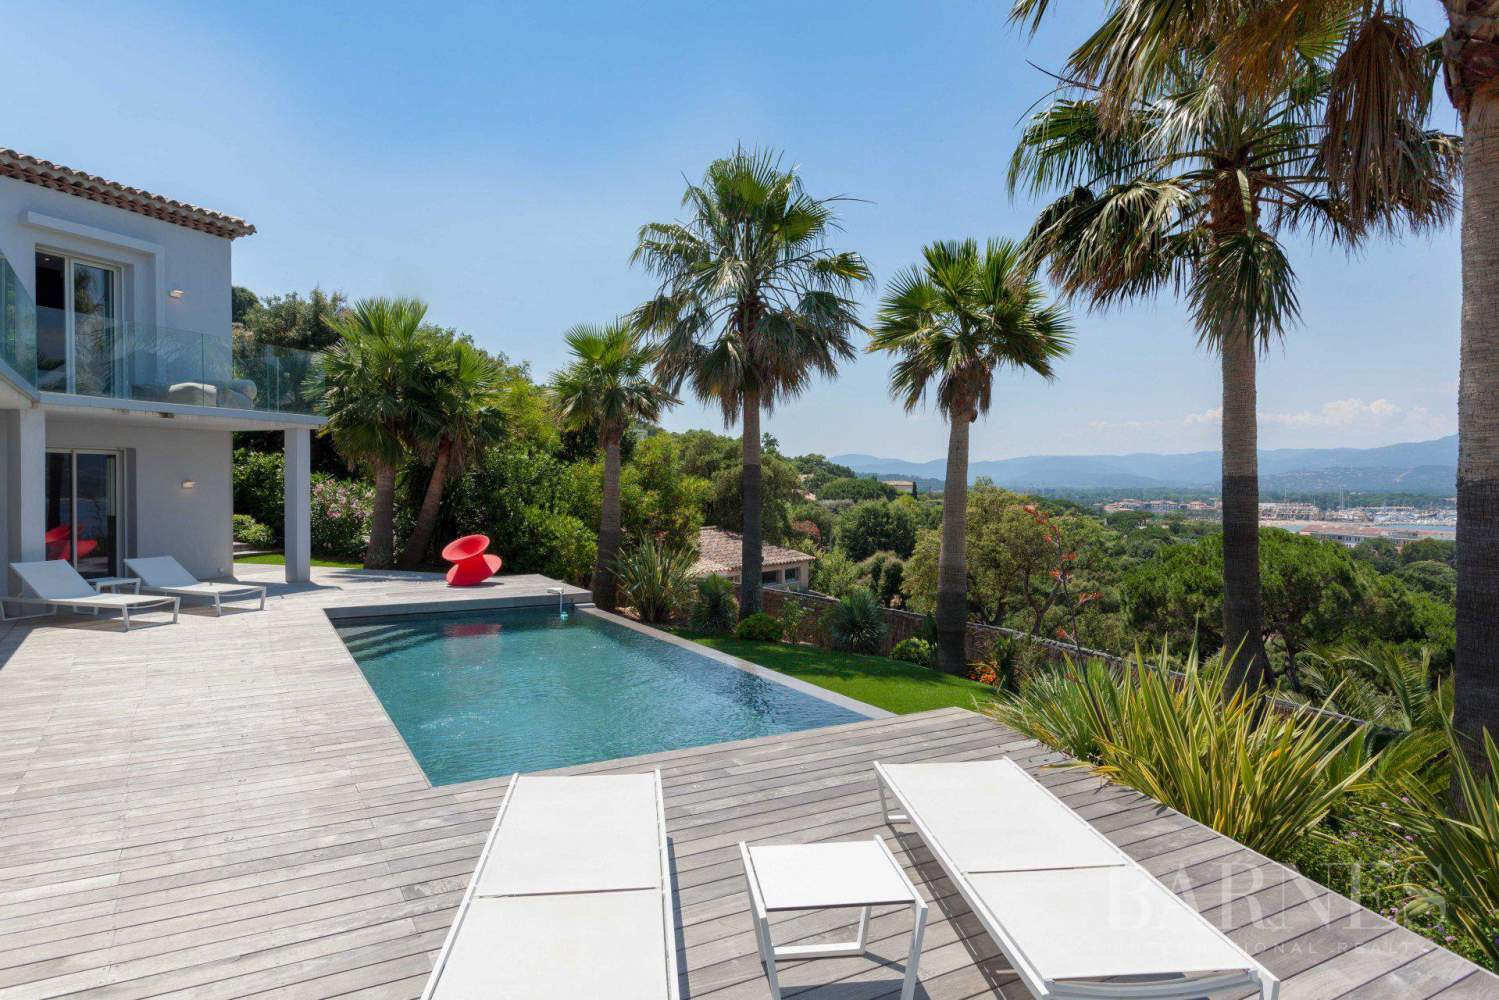 GASSIN - Contemporary house near Saint-Tropez, sea view picture 2